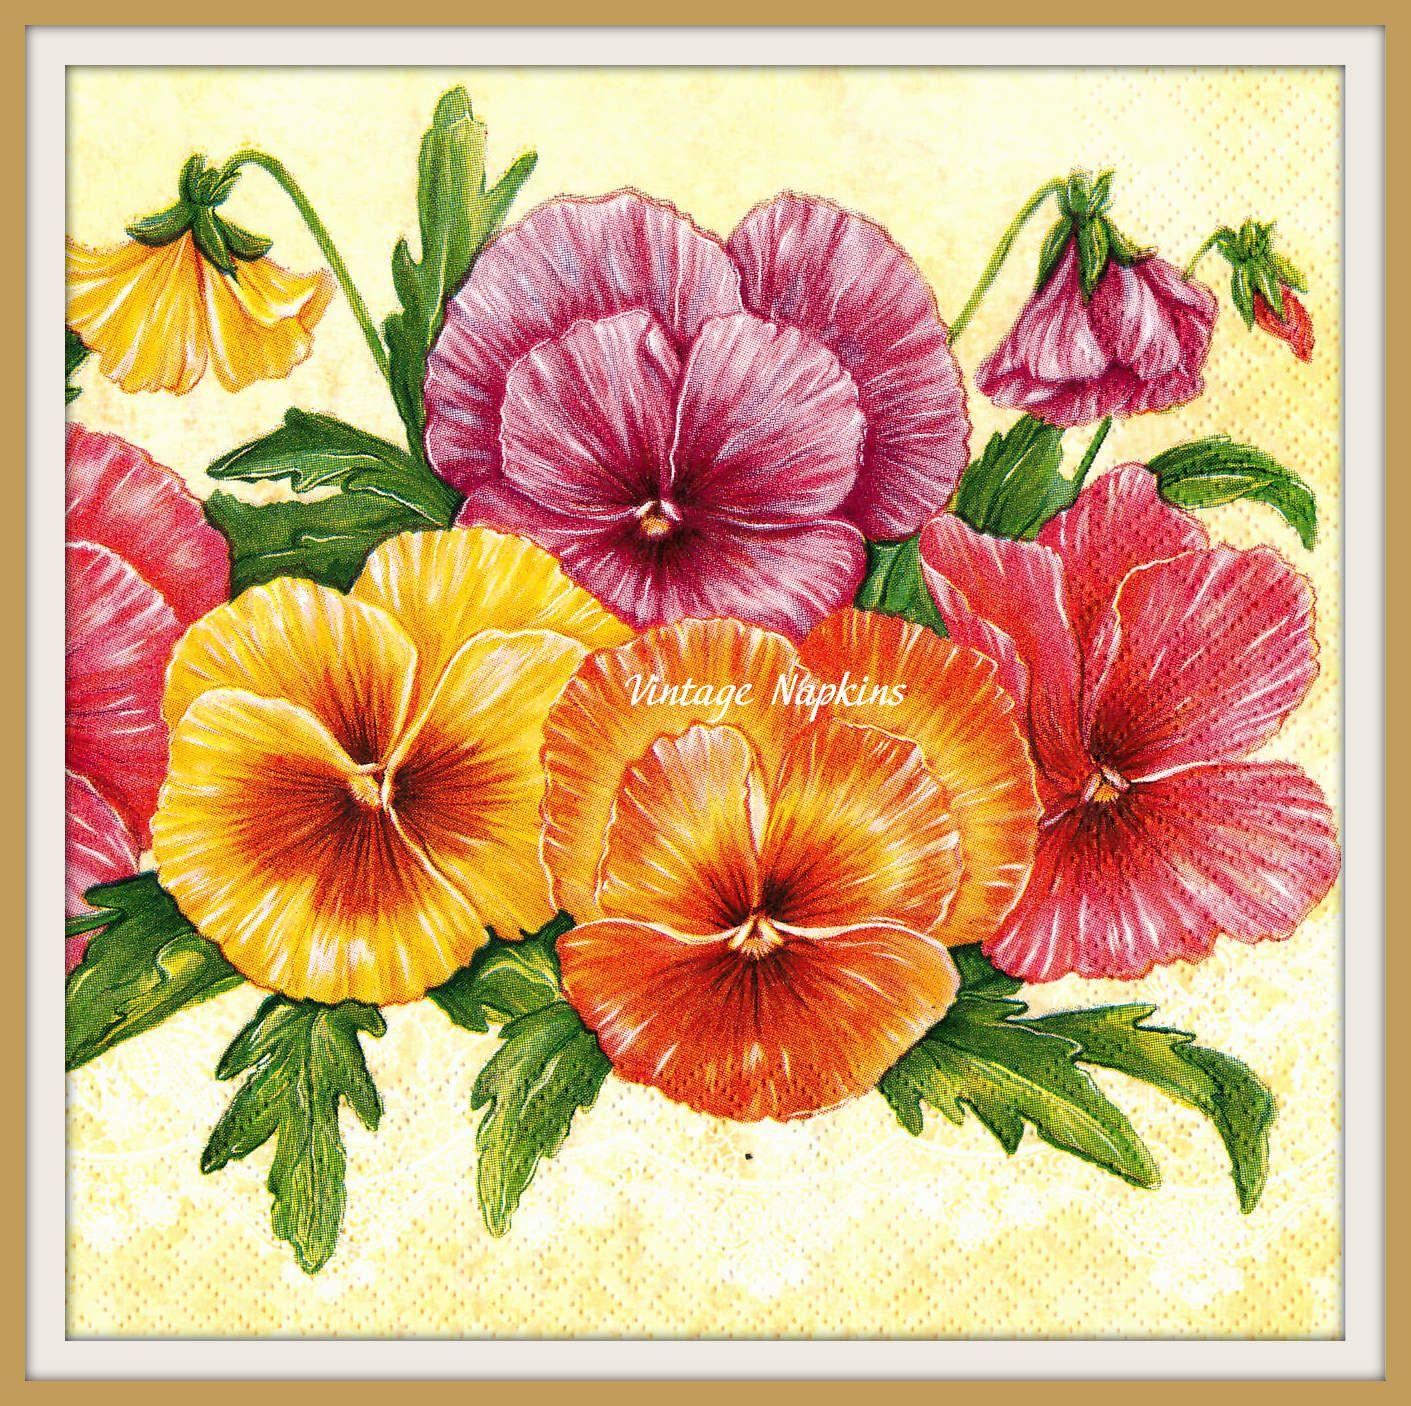 SALE *** TWO Paper napkins for DECOUPAGE - Vintage Multicolor Flowers by VintageNapkins on Etsy